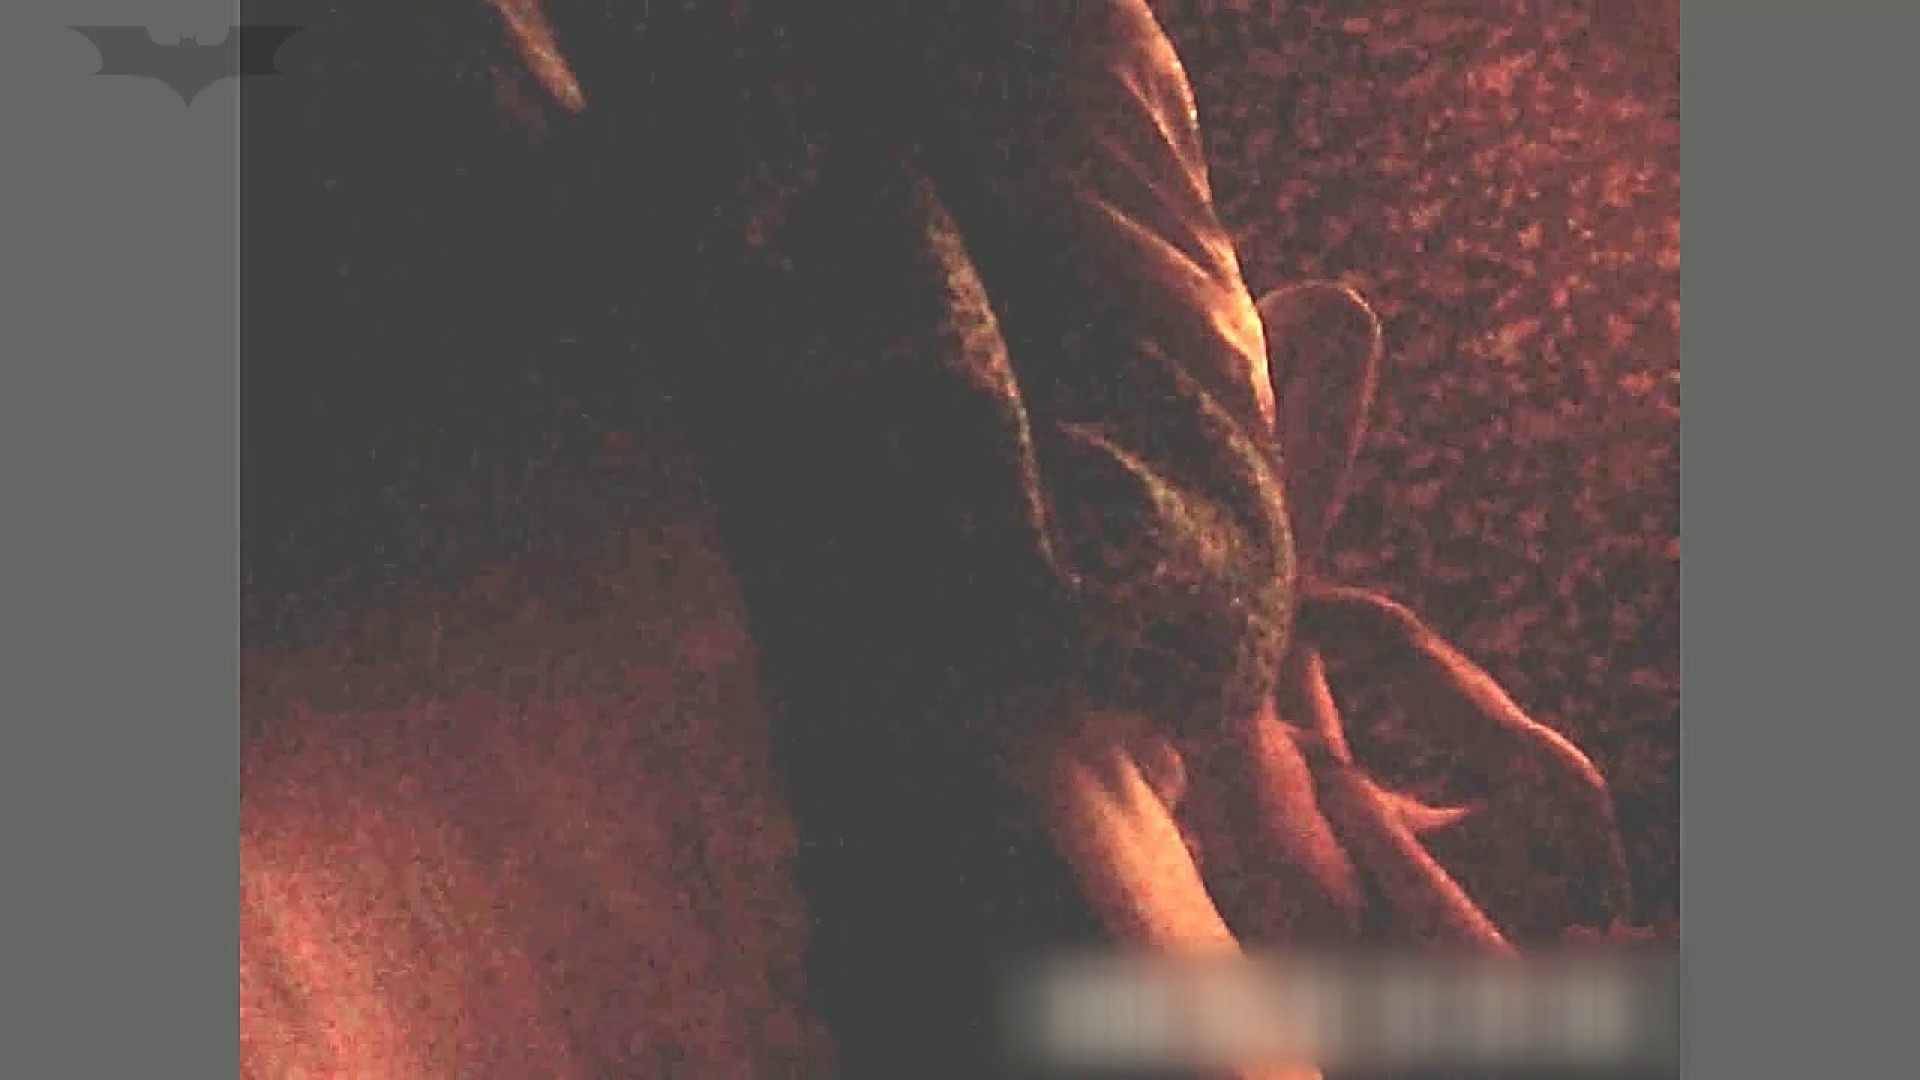 ▲2017_05位▲ 学園アイドル美人女子大生!❶4人厳選詰合せVol.49 人気作   女子大生  113画像 52